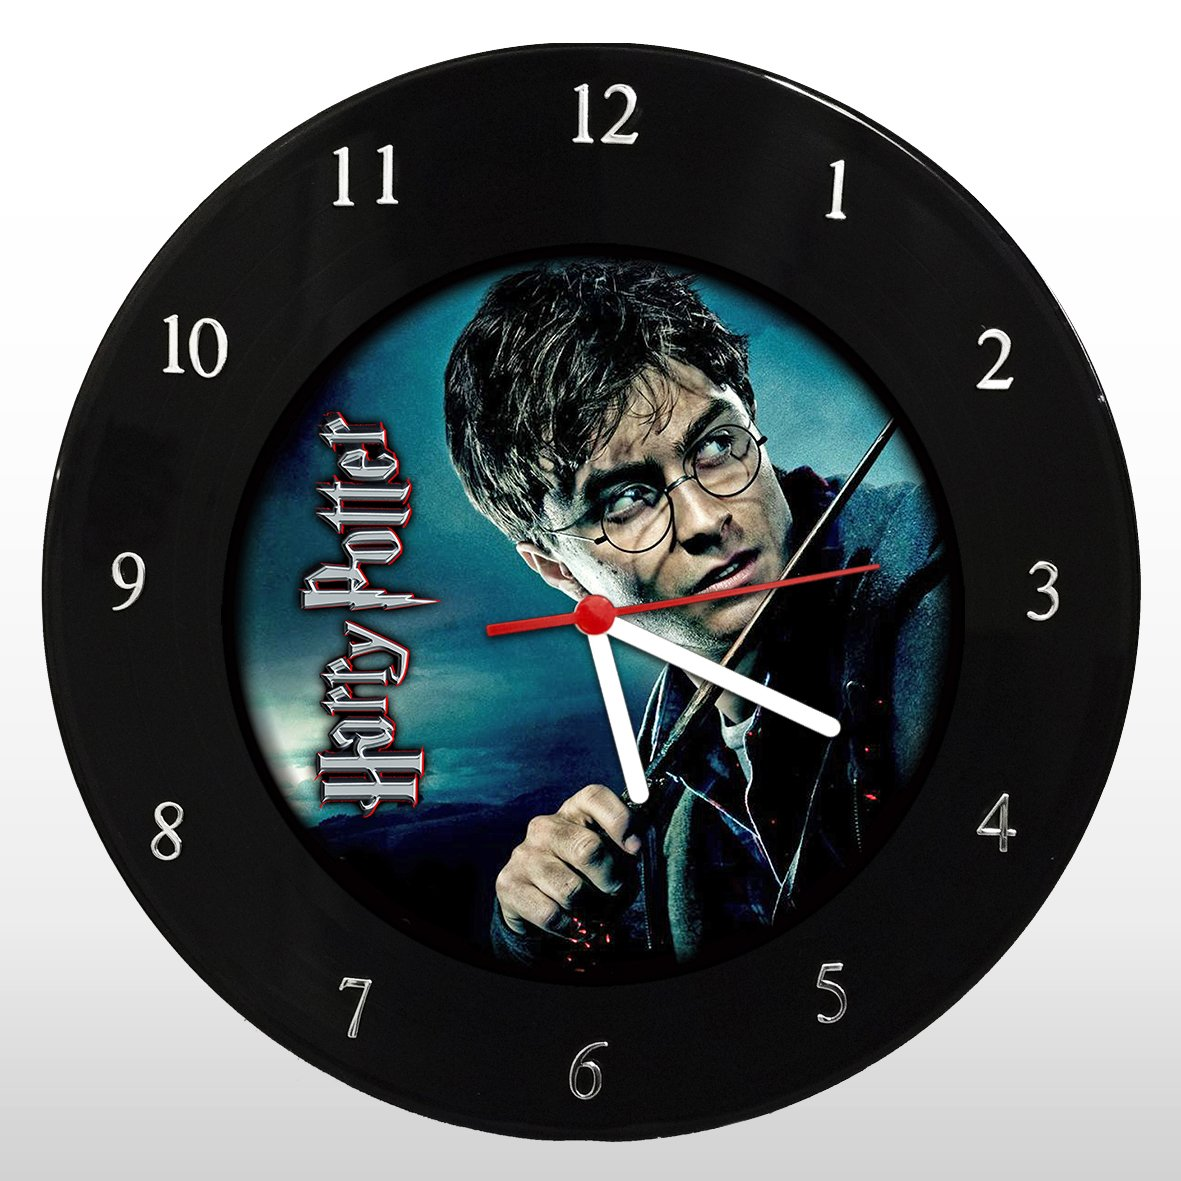 Harry Potter - Relógio de Parede em Disco de Vinil - Mr. Rock